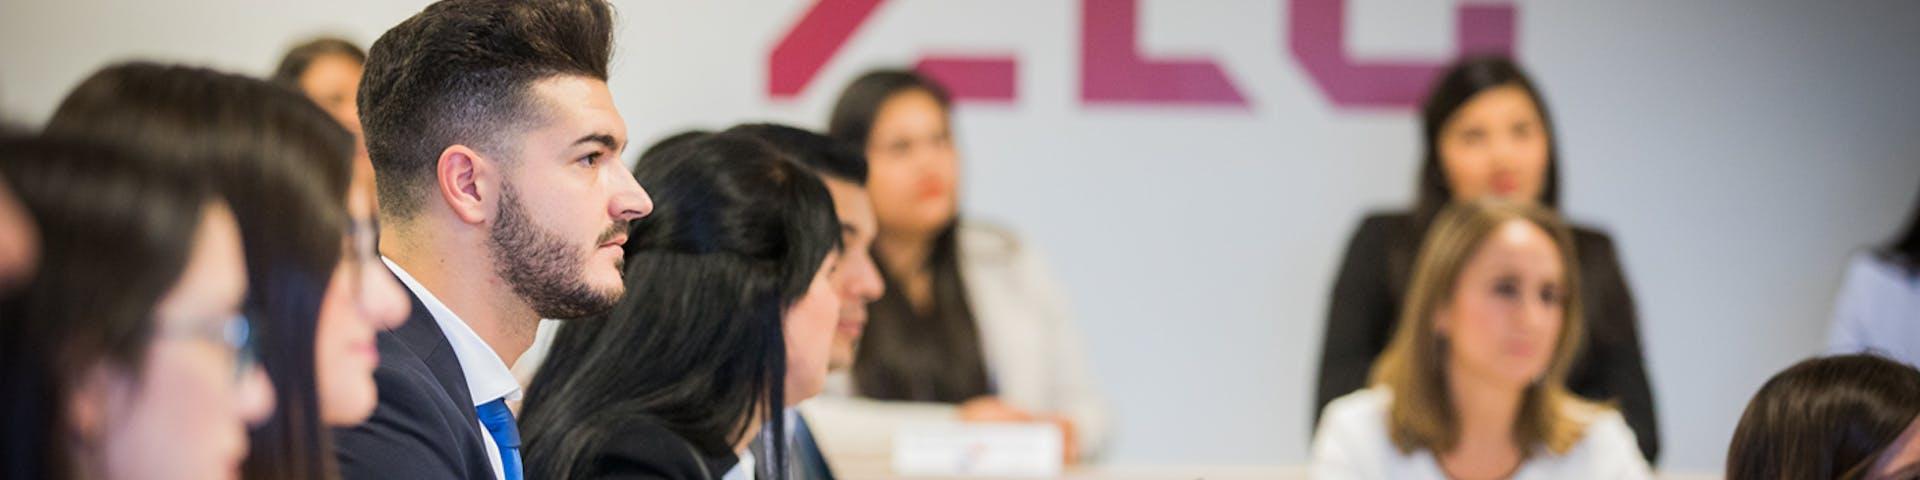 MIT Zaragoza Master in Logistics and Supply Chain Management